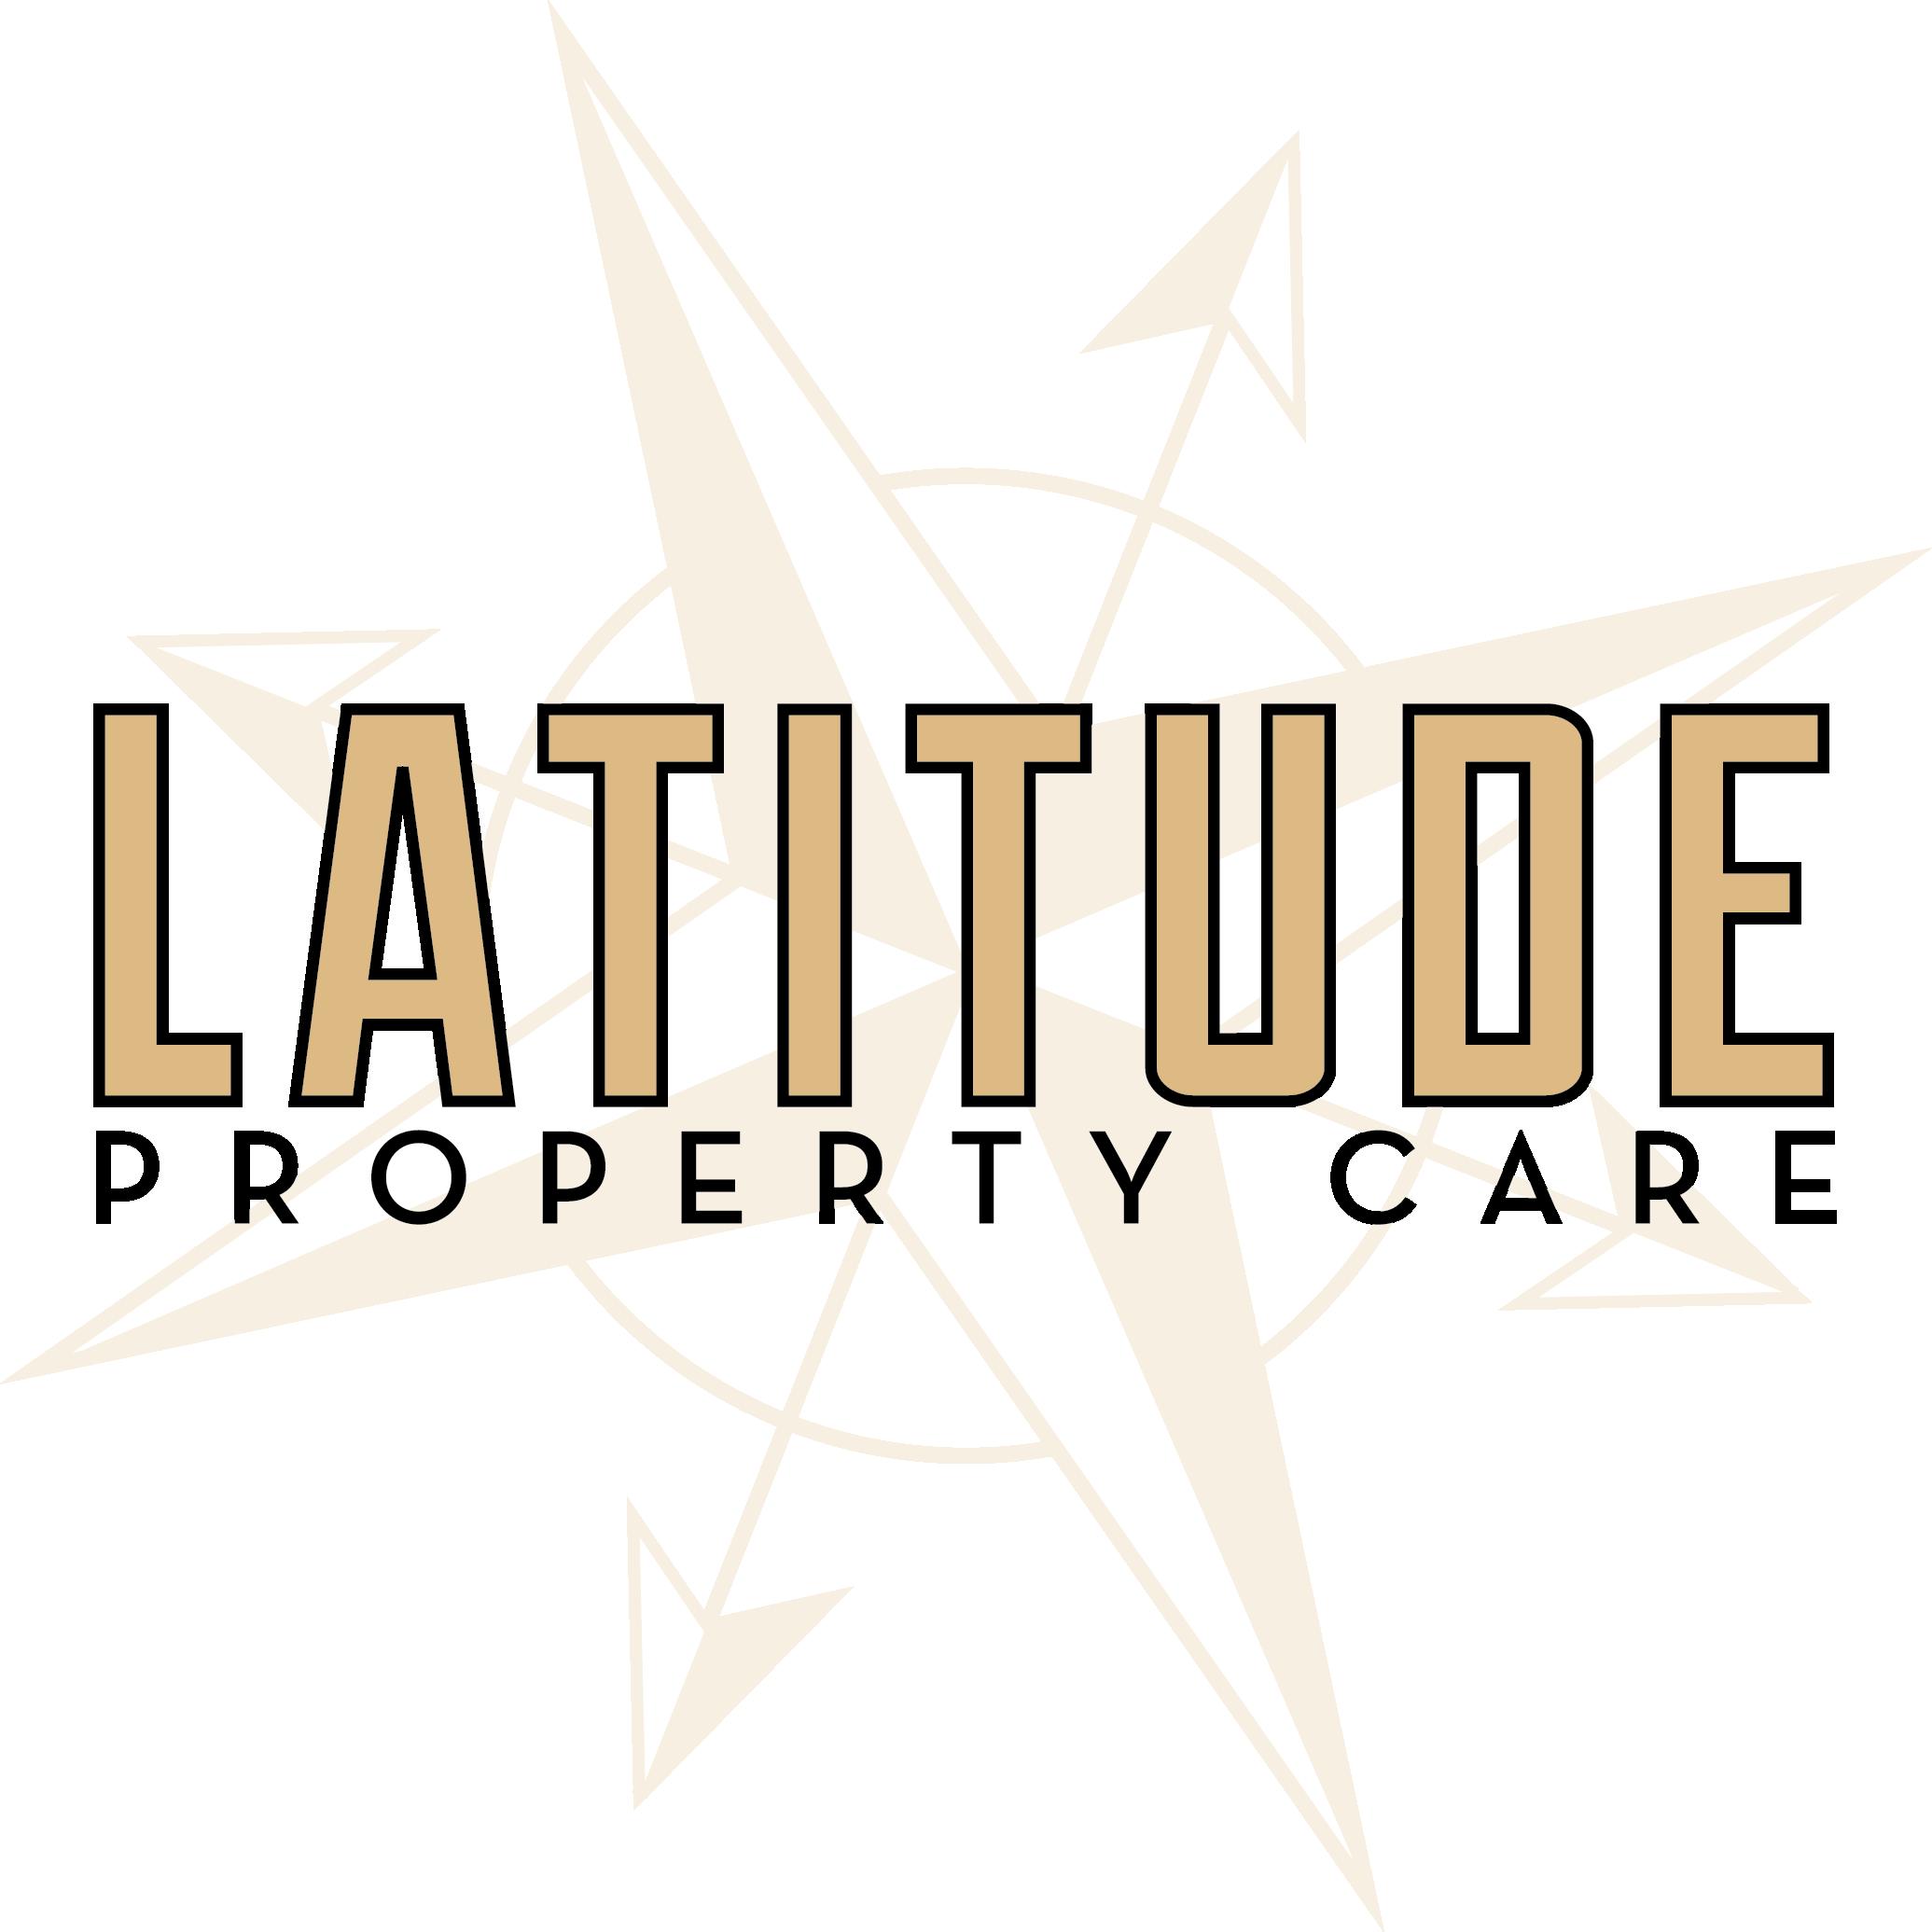 Latitude Property Care